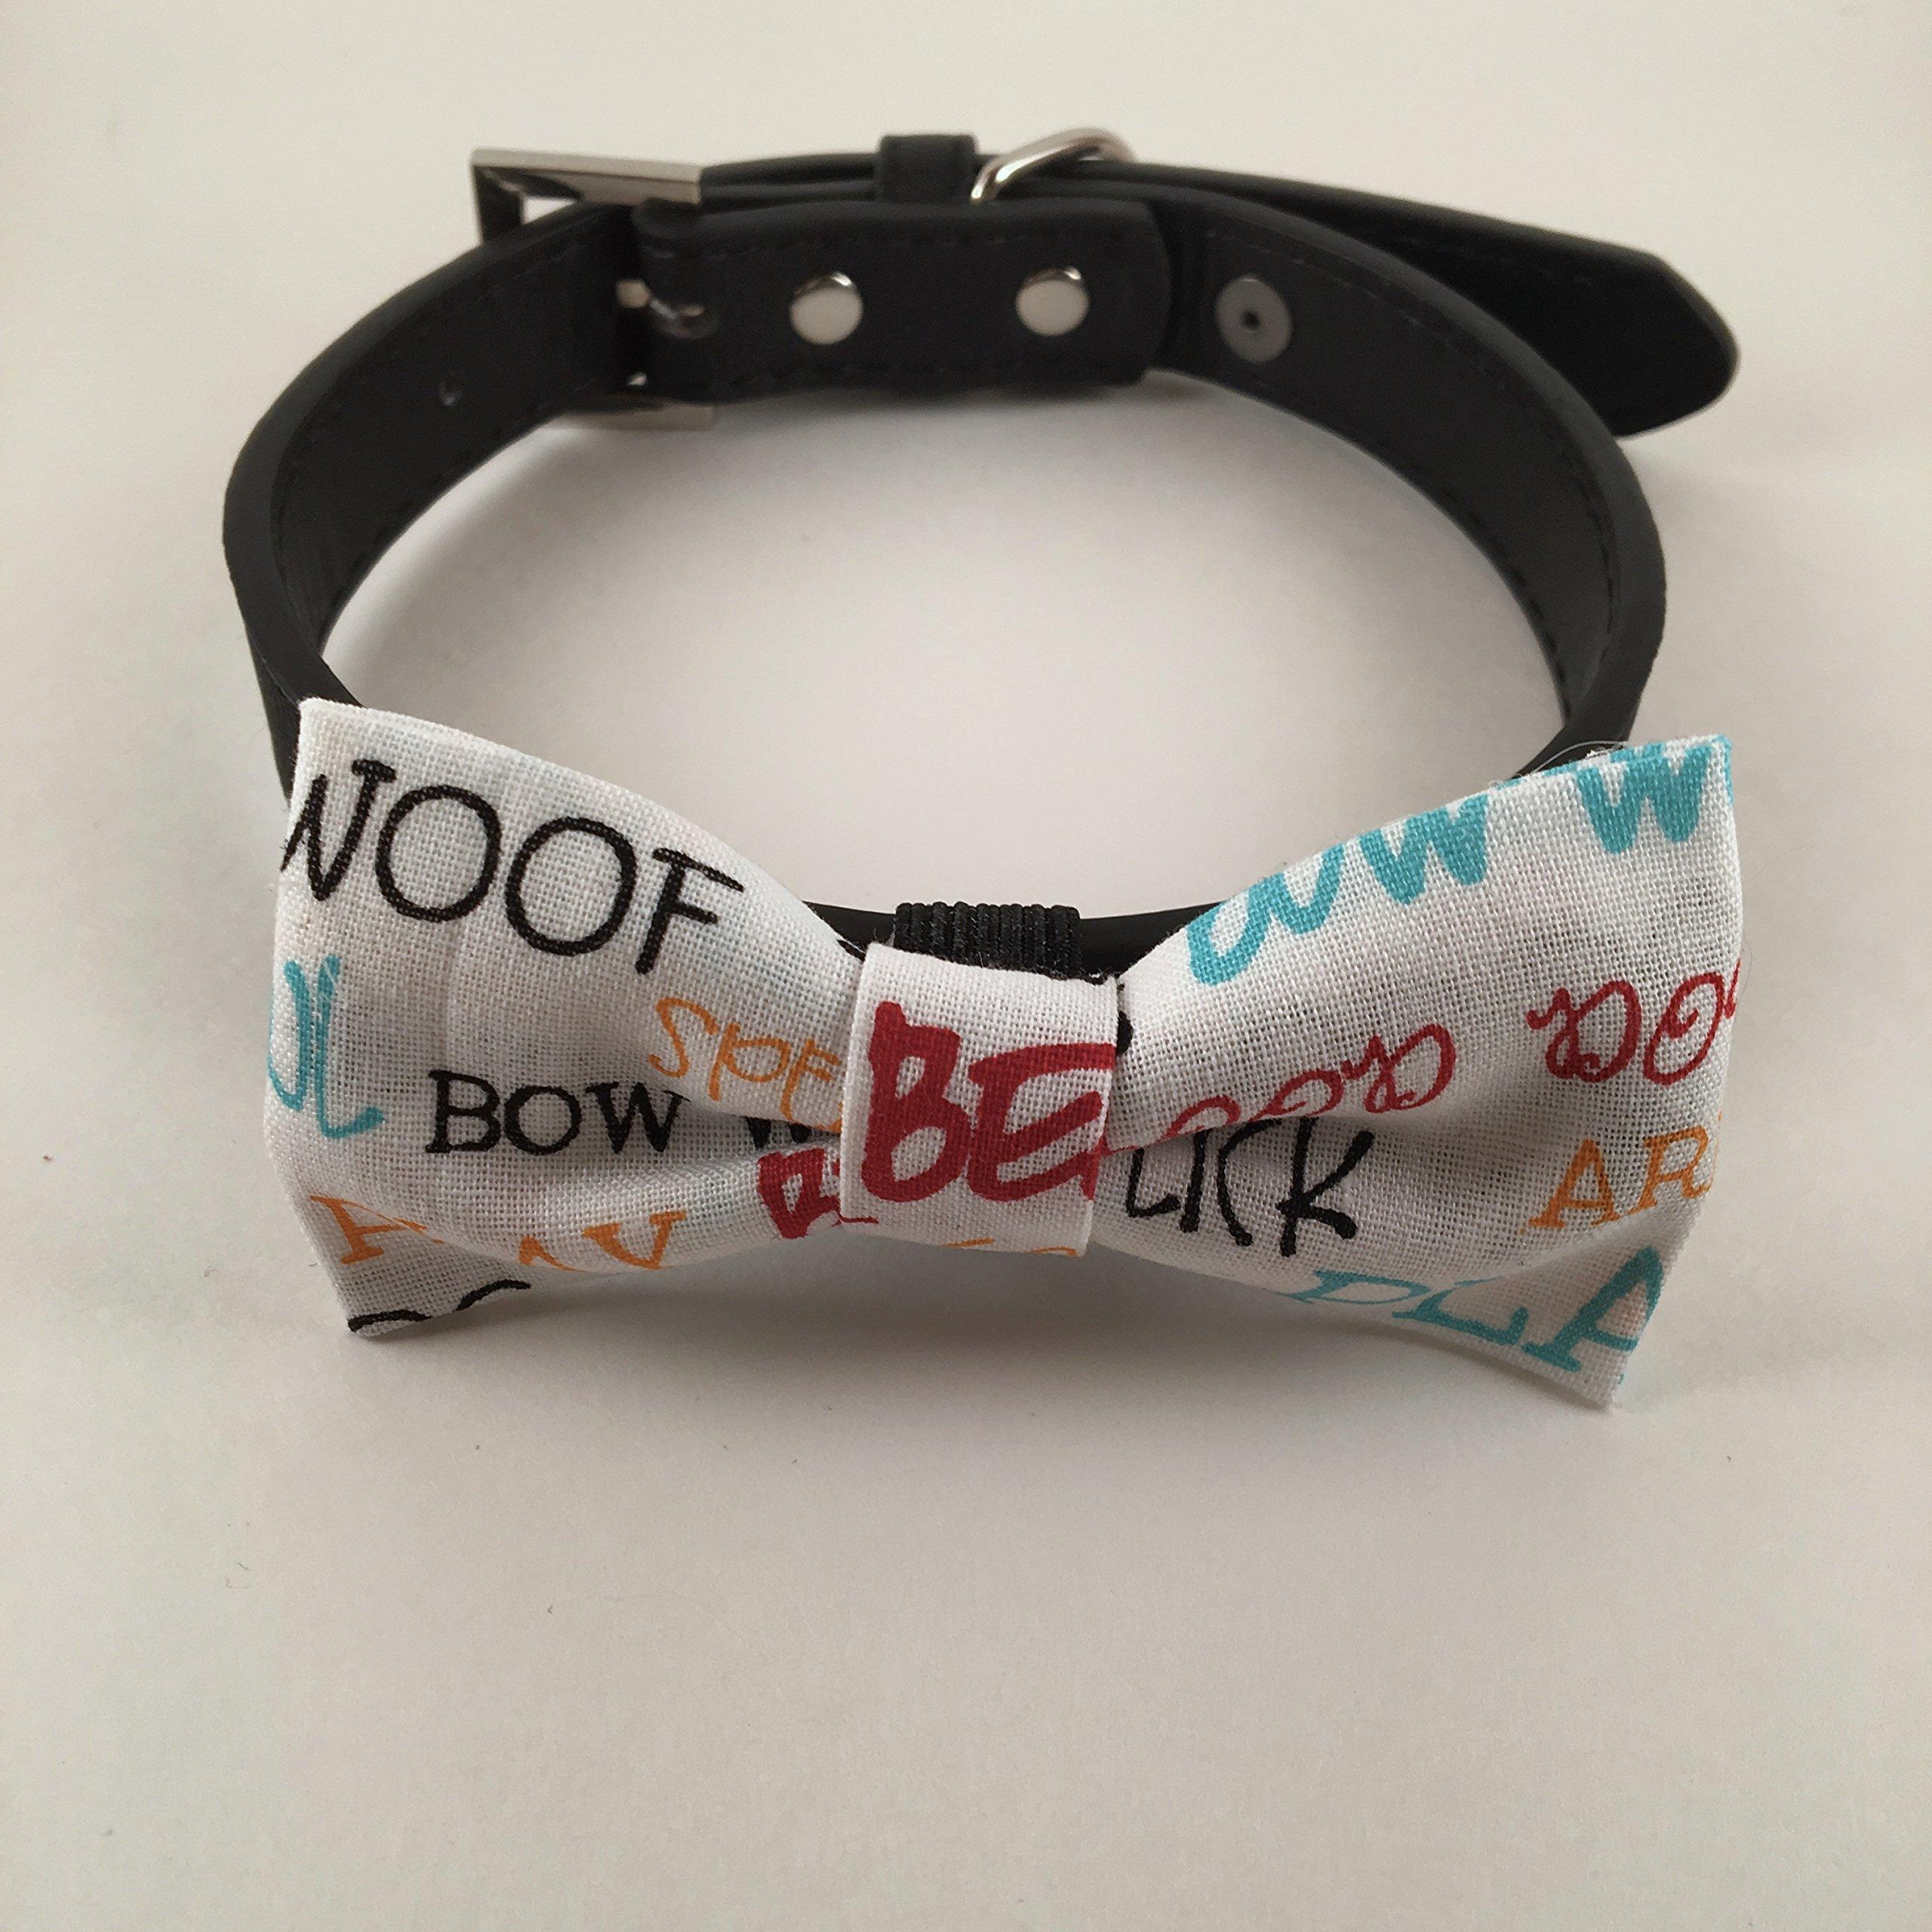 Dog (stuff) Bow Tie